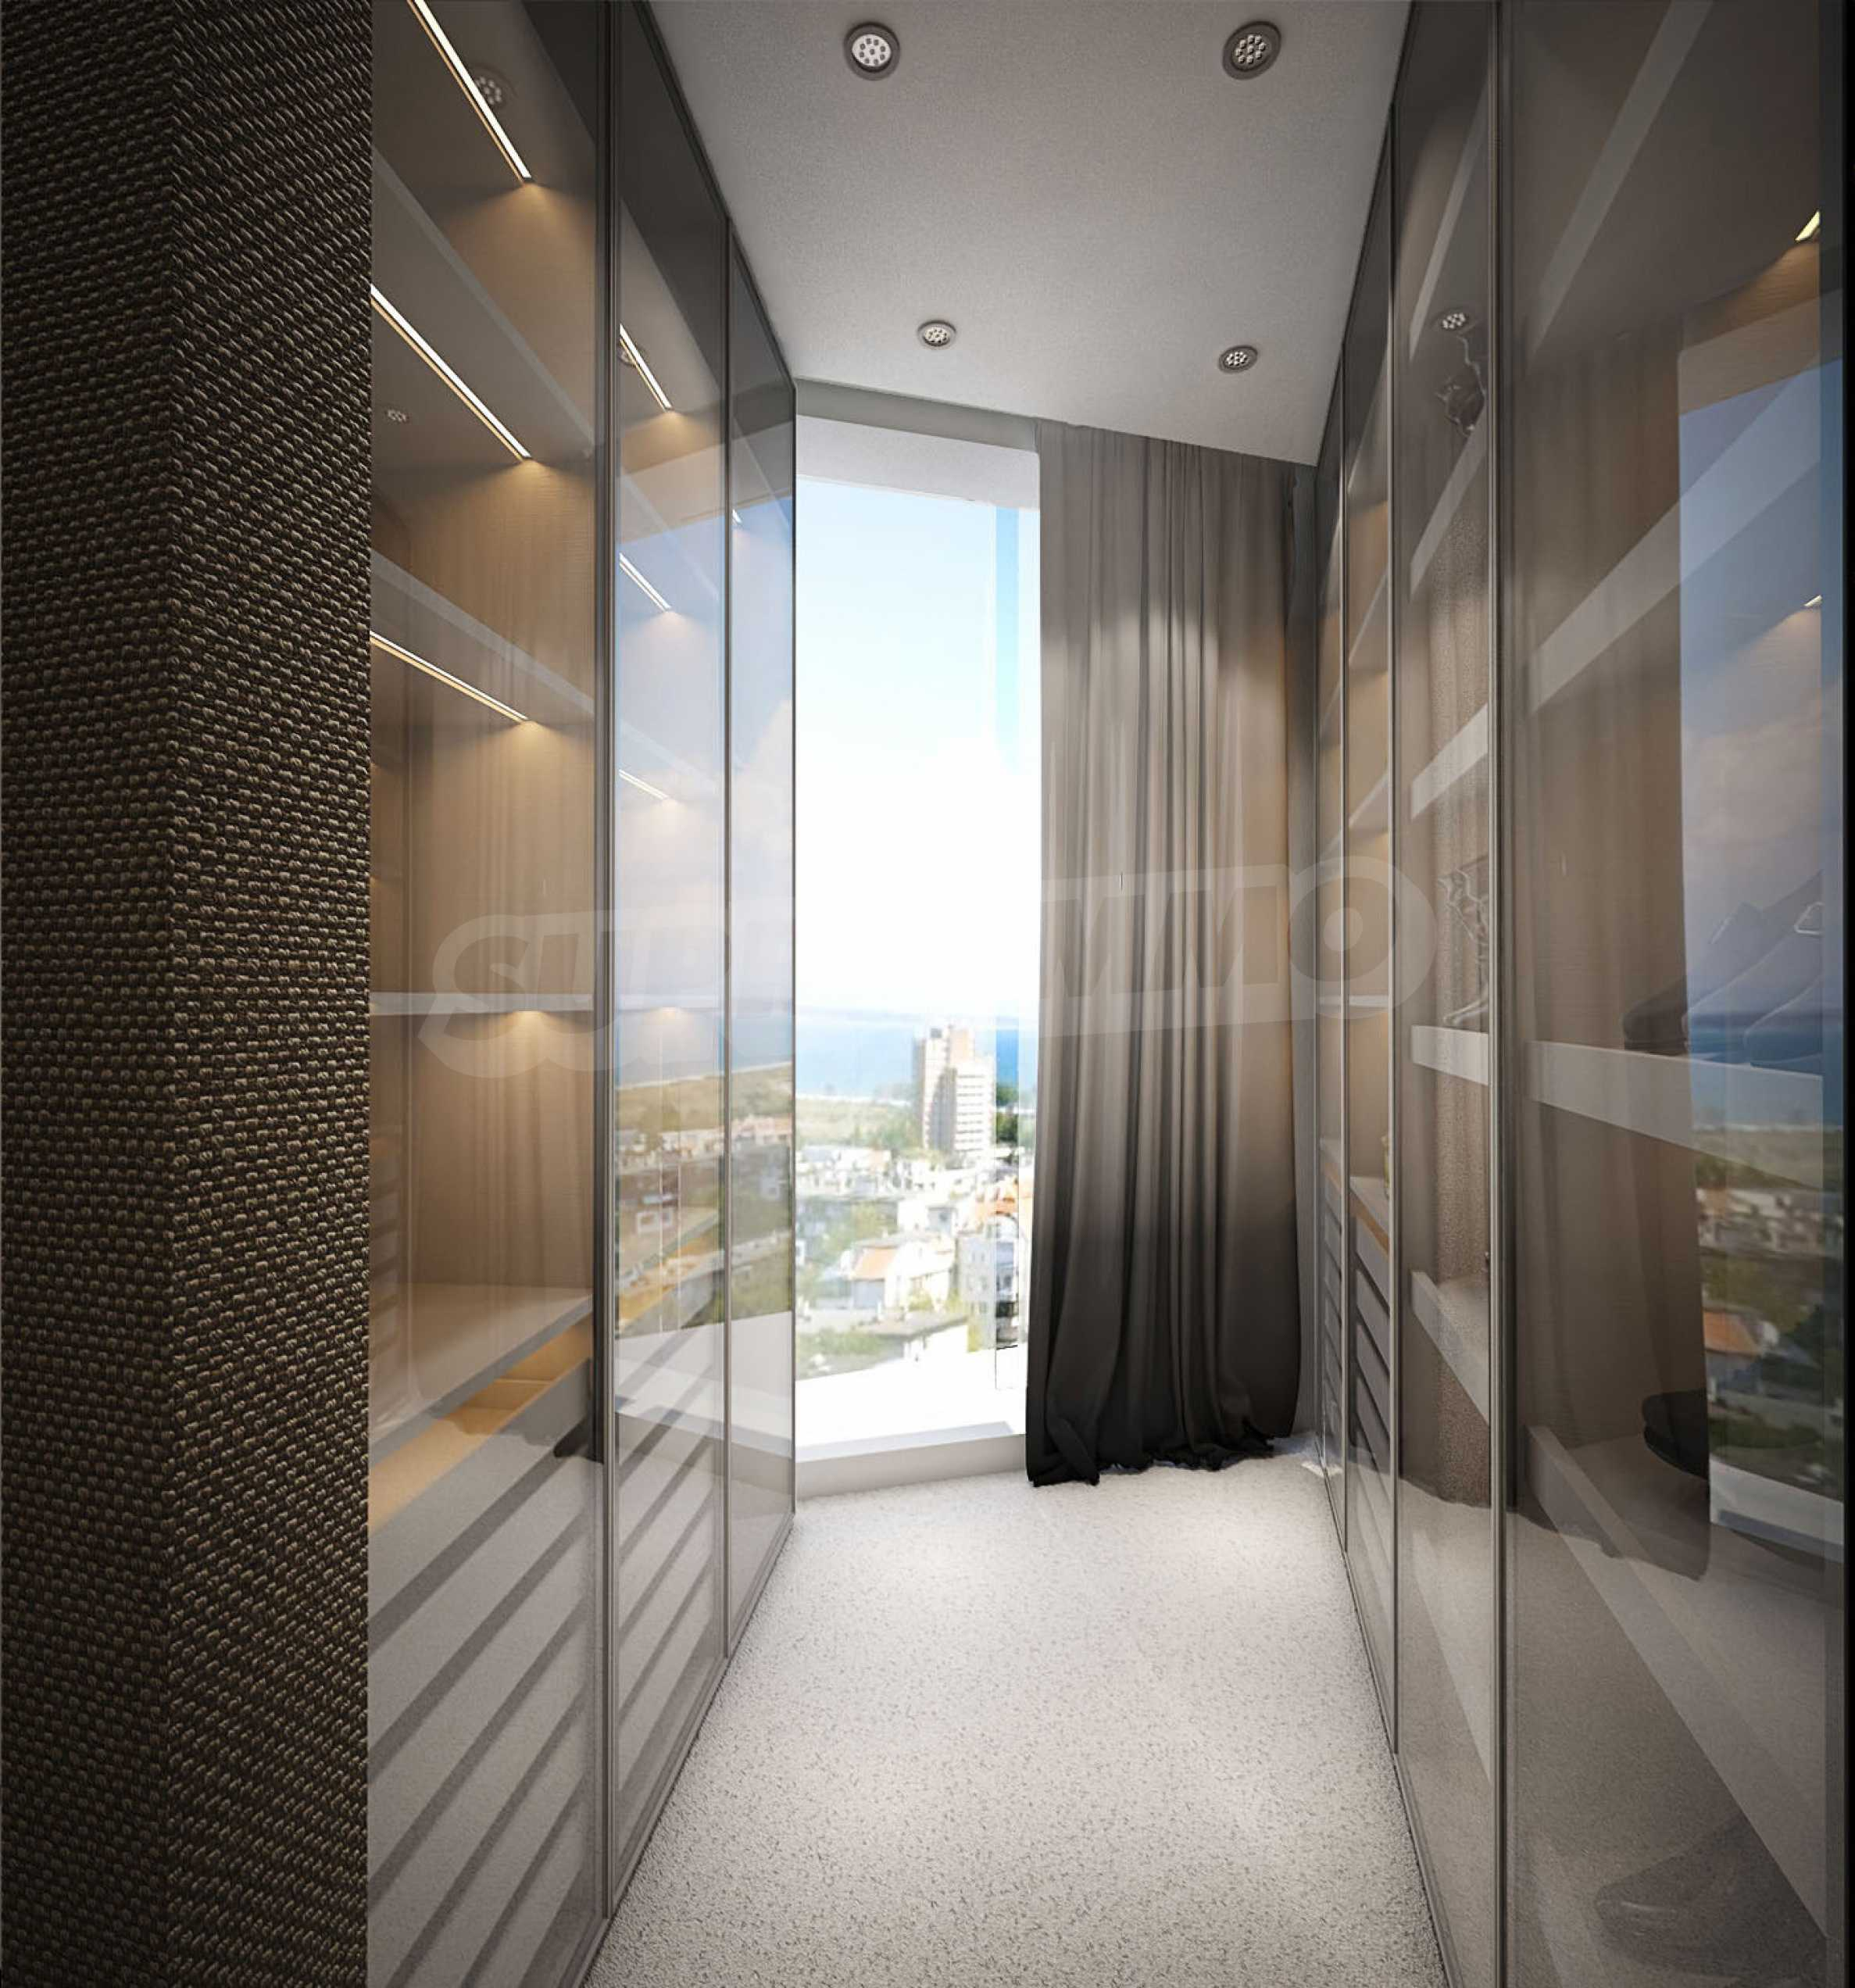 Нова сграда с луксозни апартаменти в гр. Бургас 64